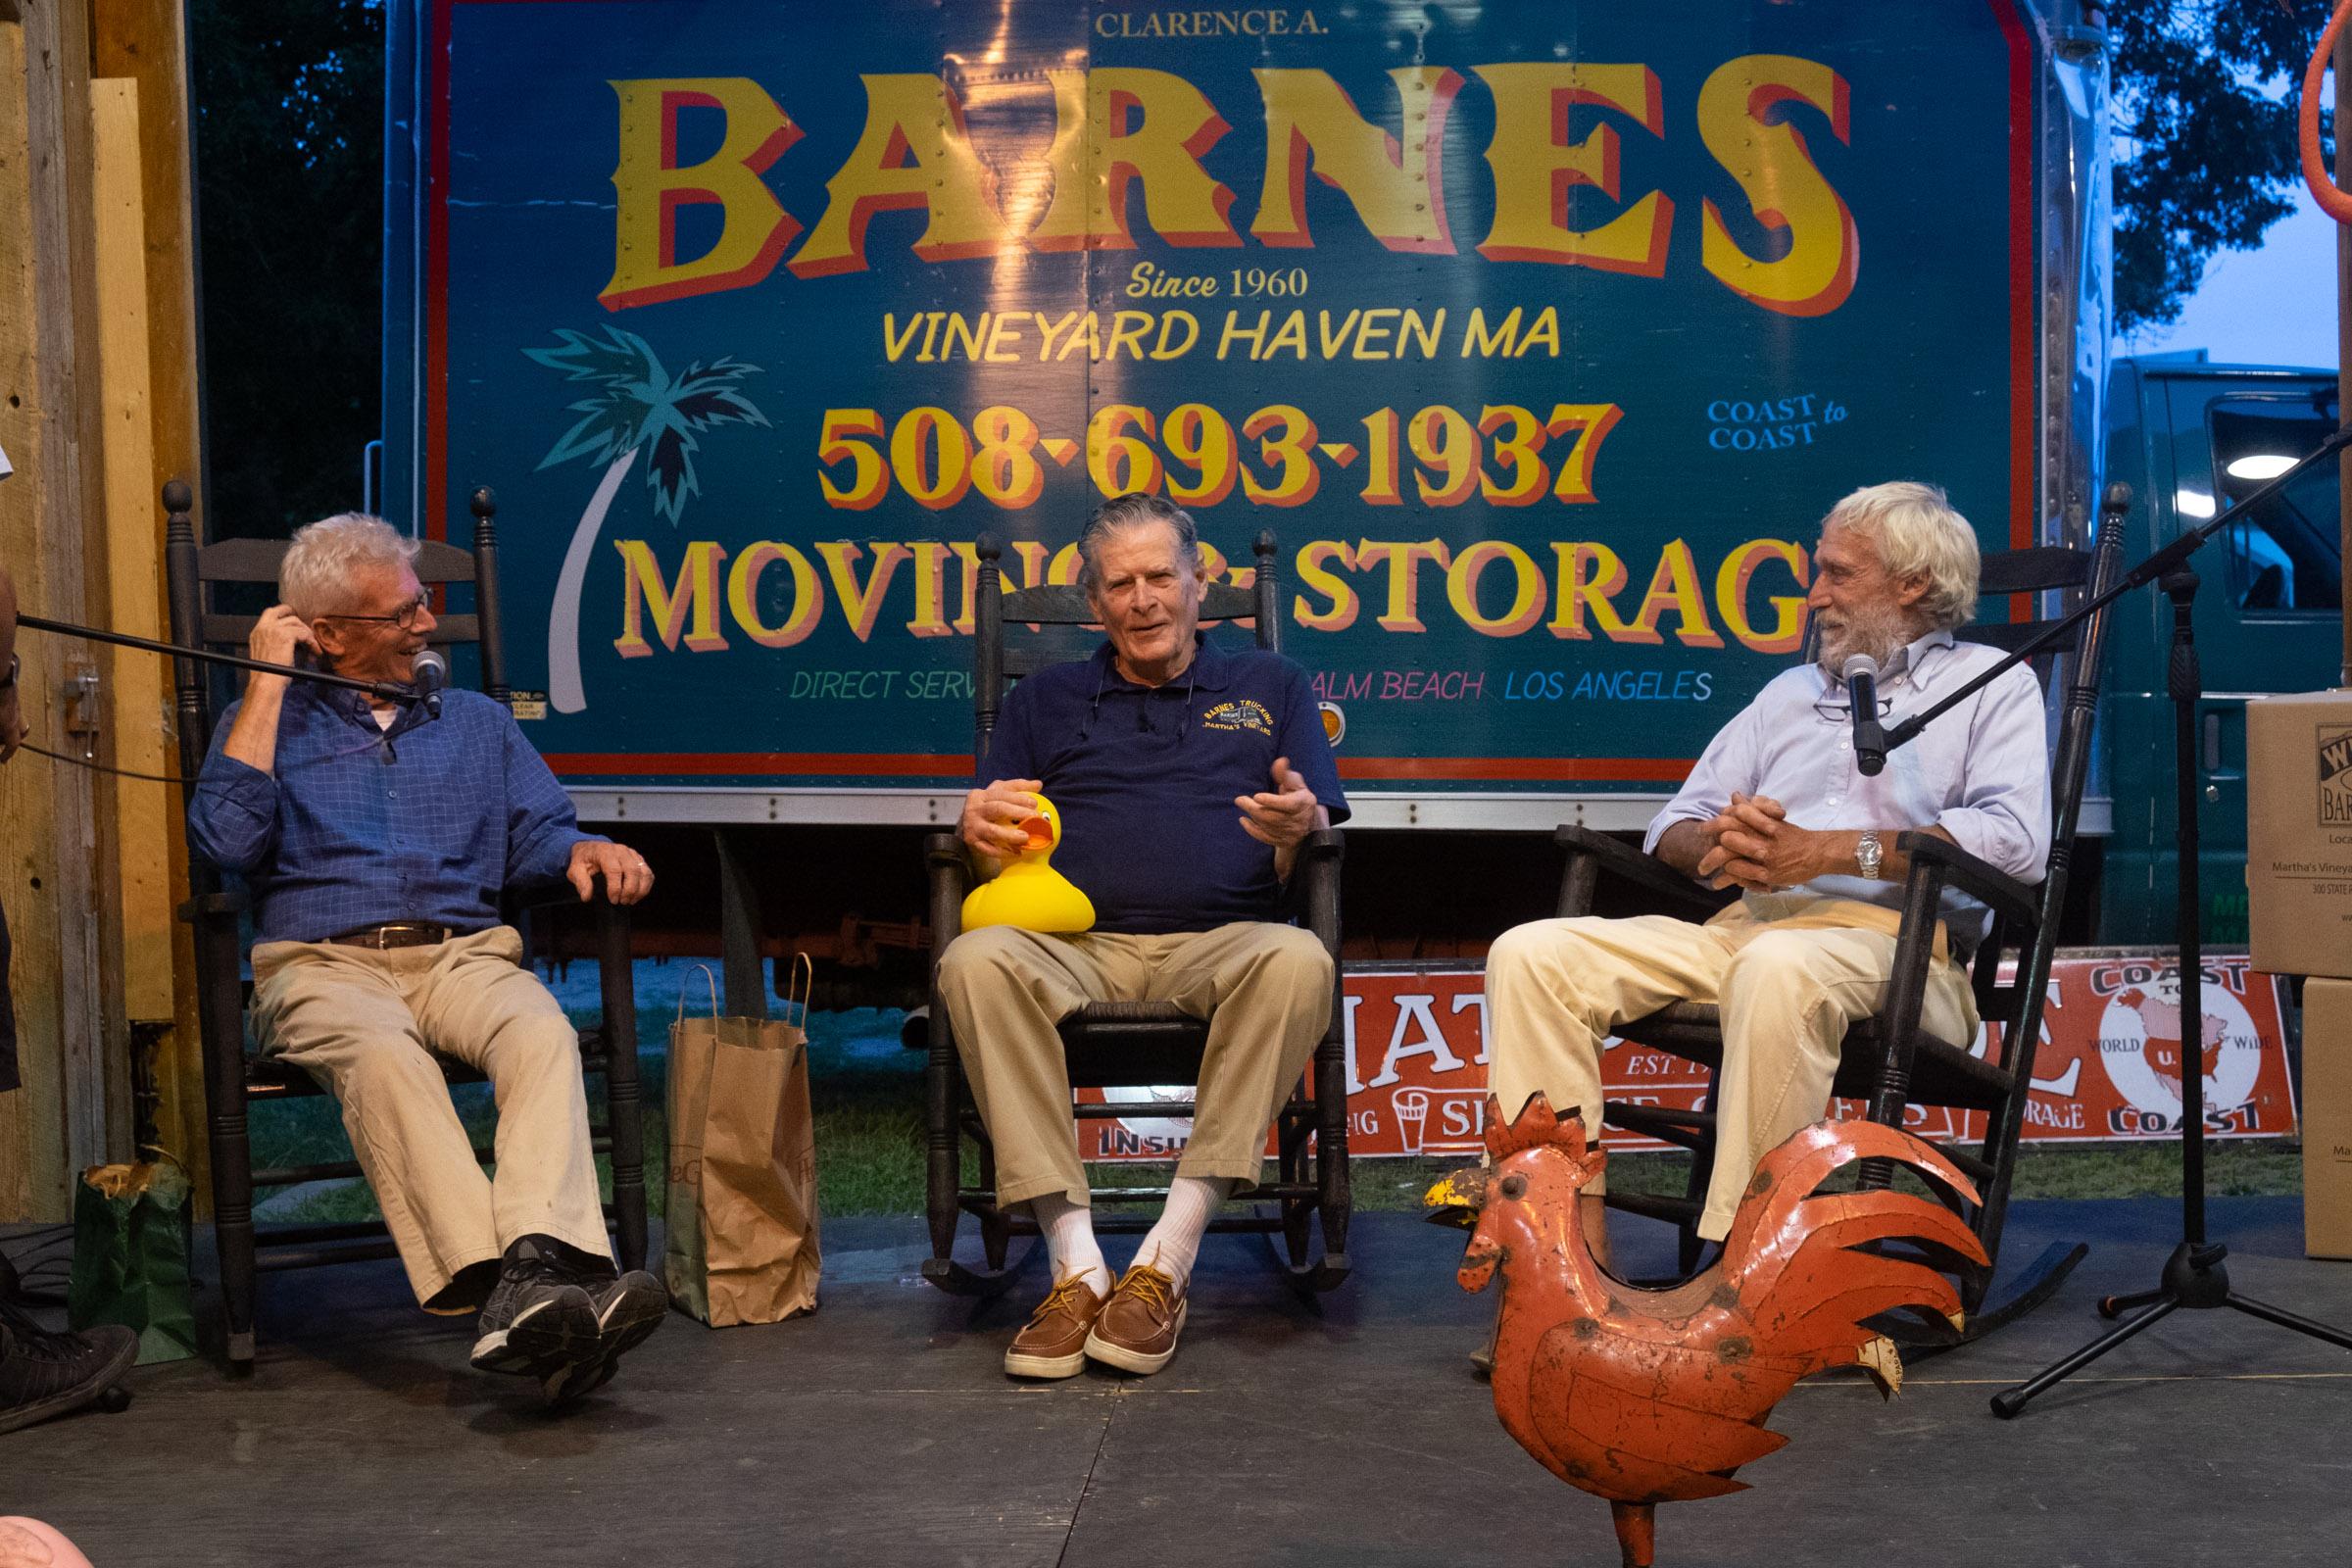 Trip Barnes Creative Living event 2018, a rollicking evening!